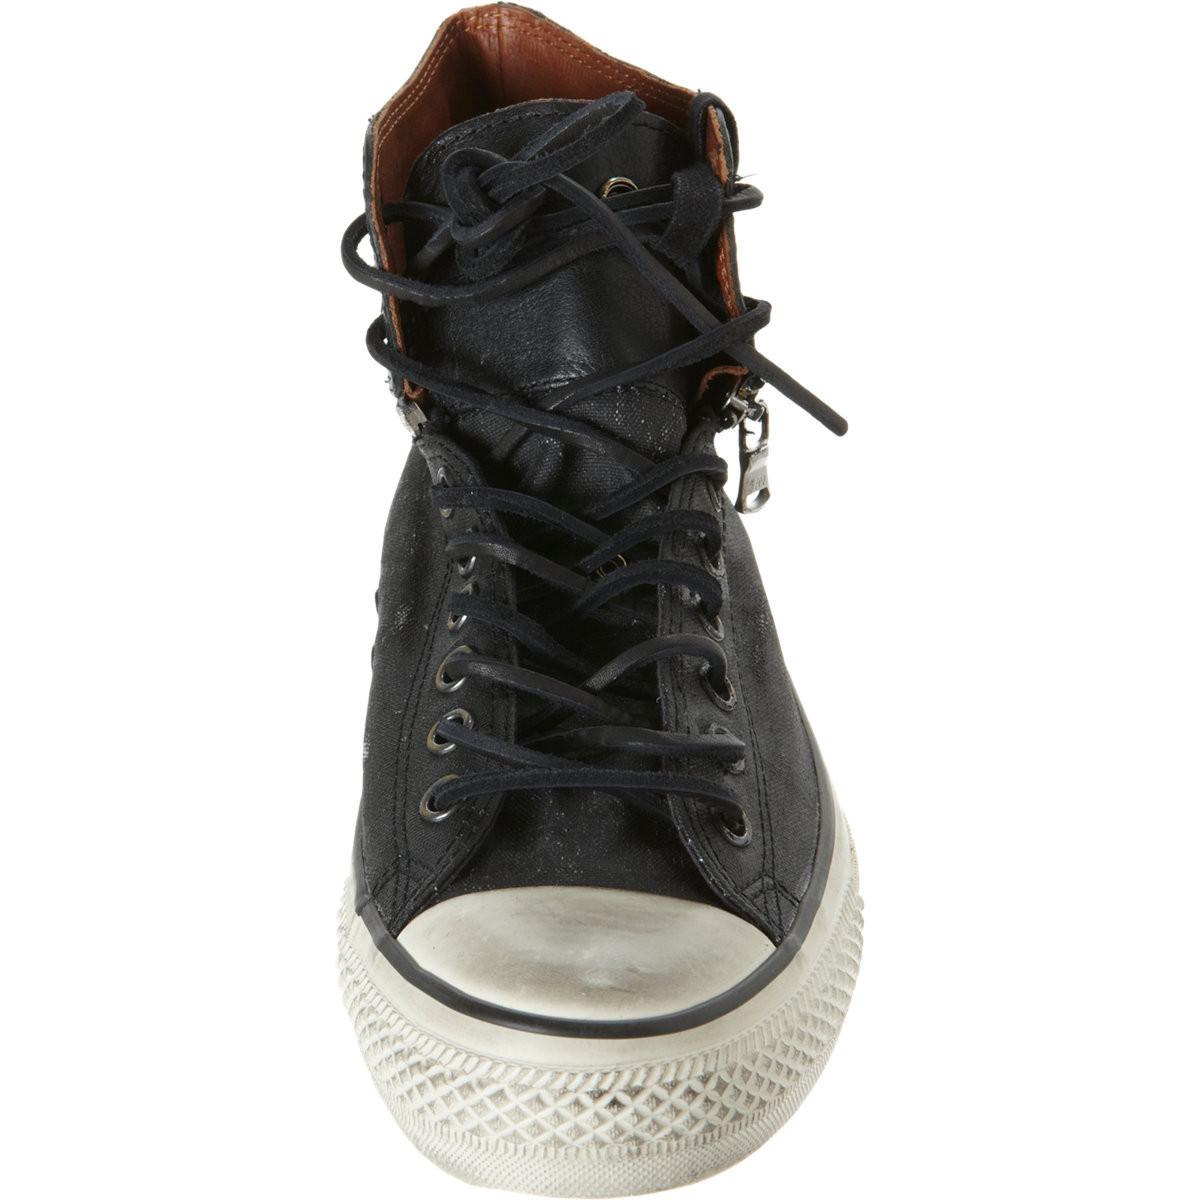 f49dce766e3441 Converse by John Varvatos Chuck Taylor Studded Zipper High Top Sneakers.  Price   170.00. Image 1. Larger   More Photos